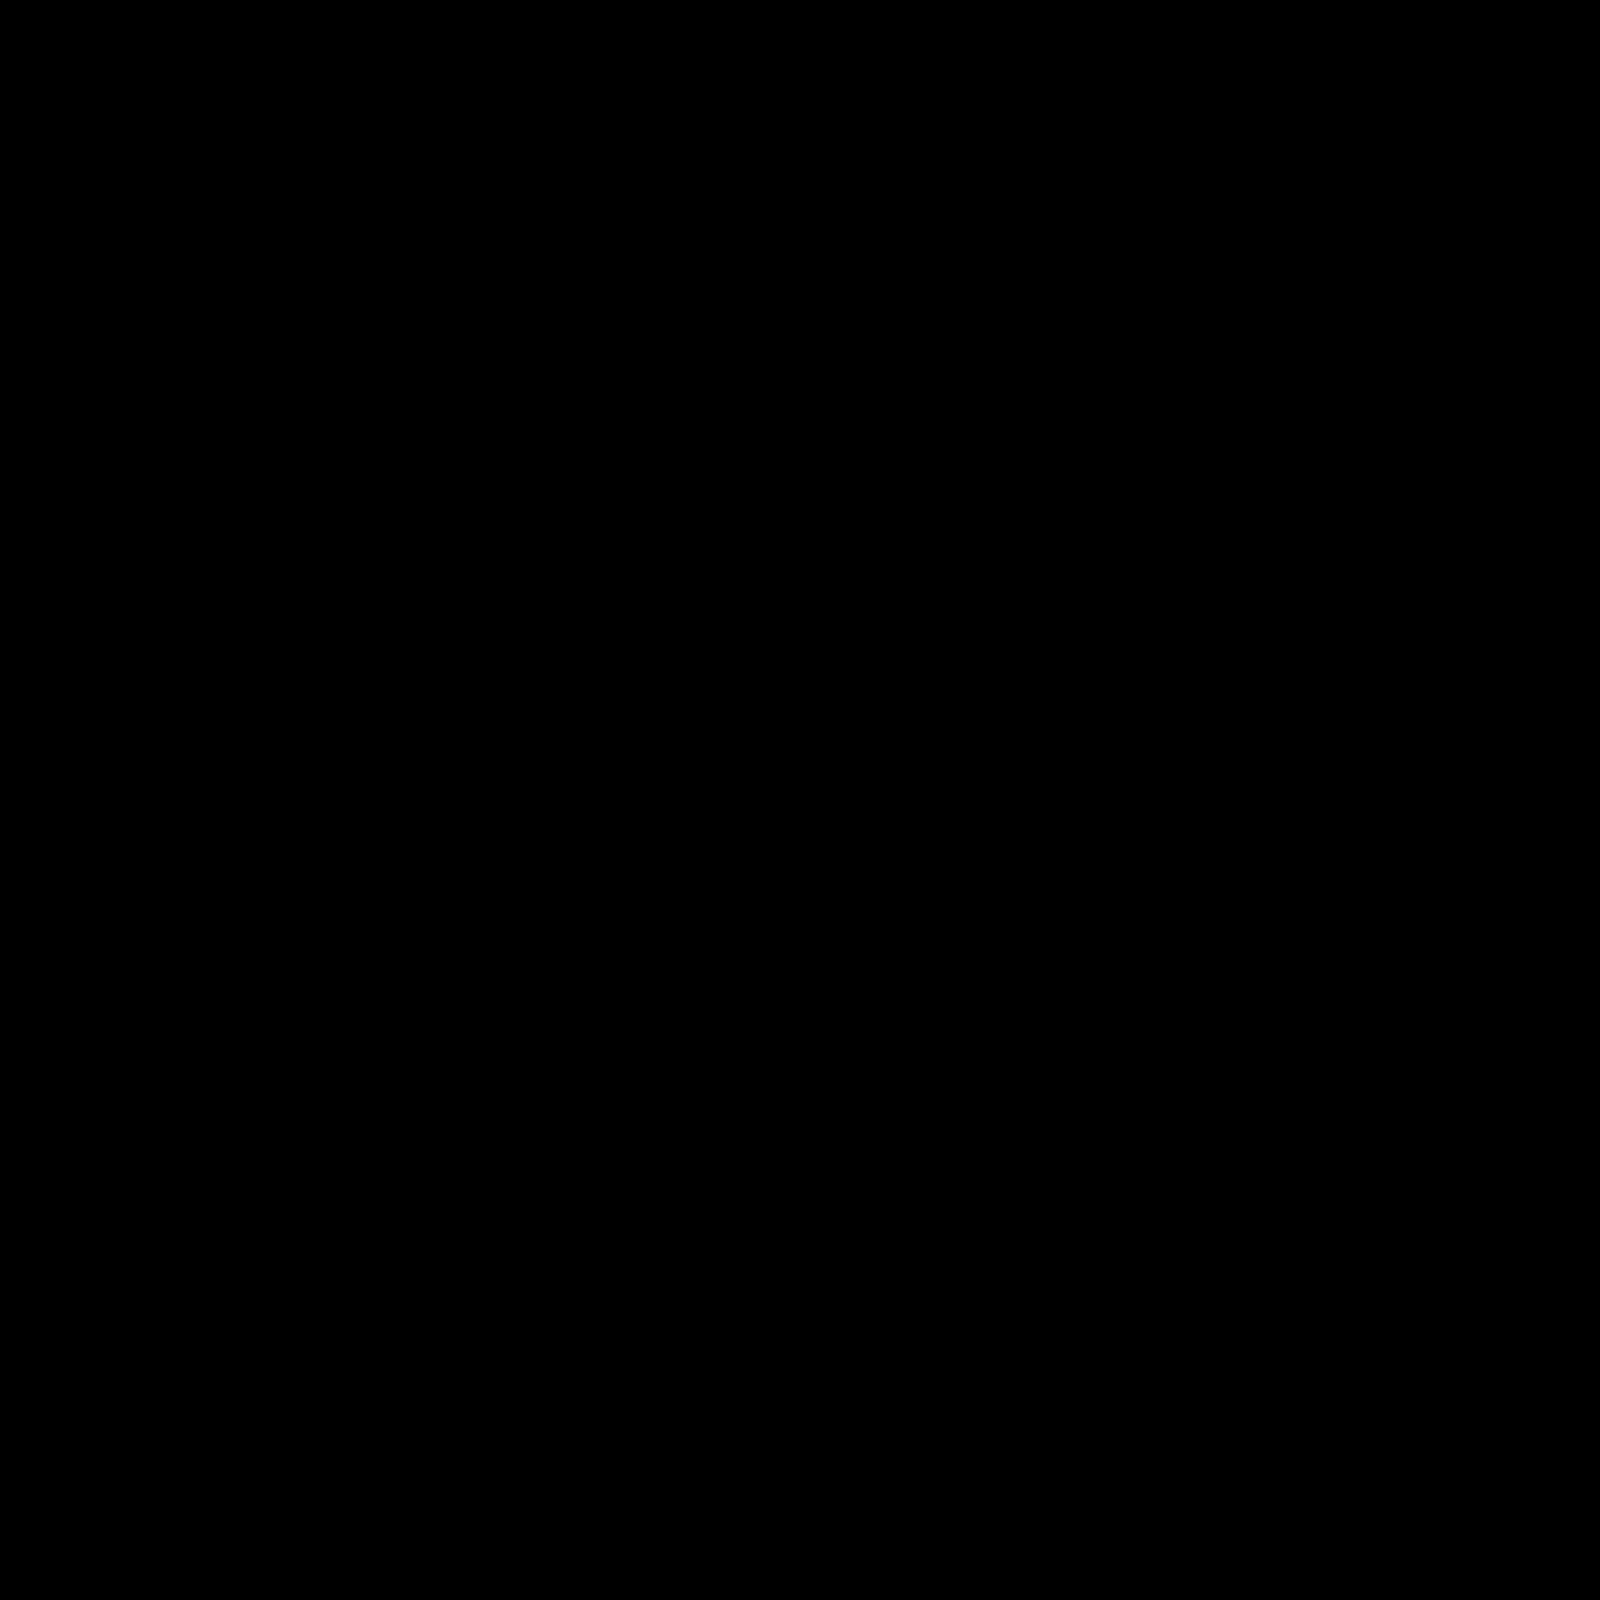 logo Mastercard icon